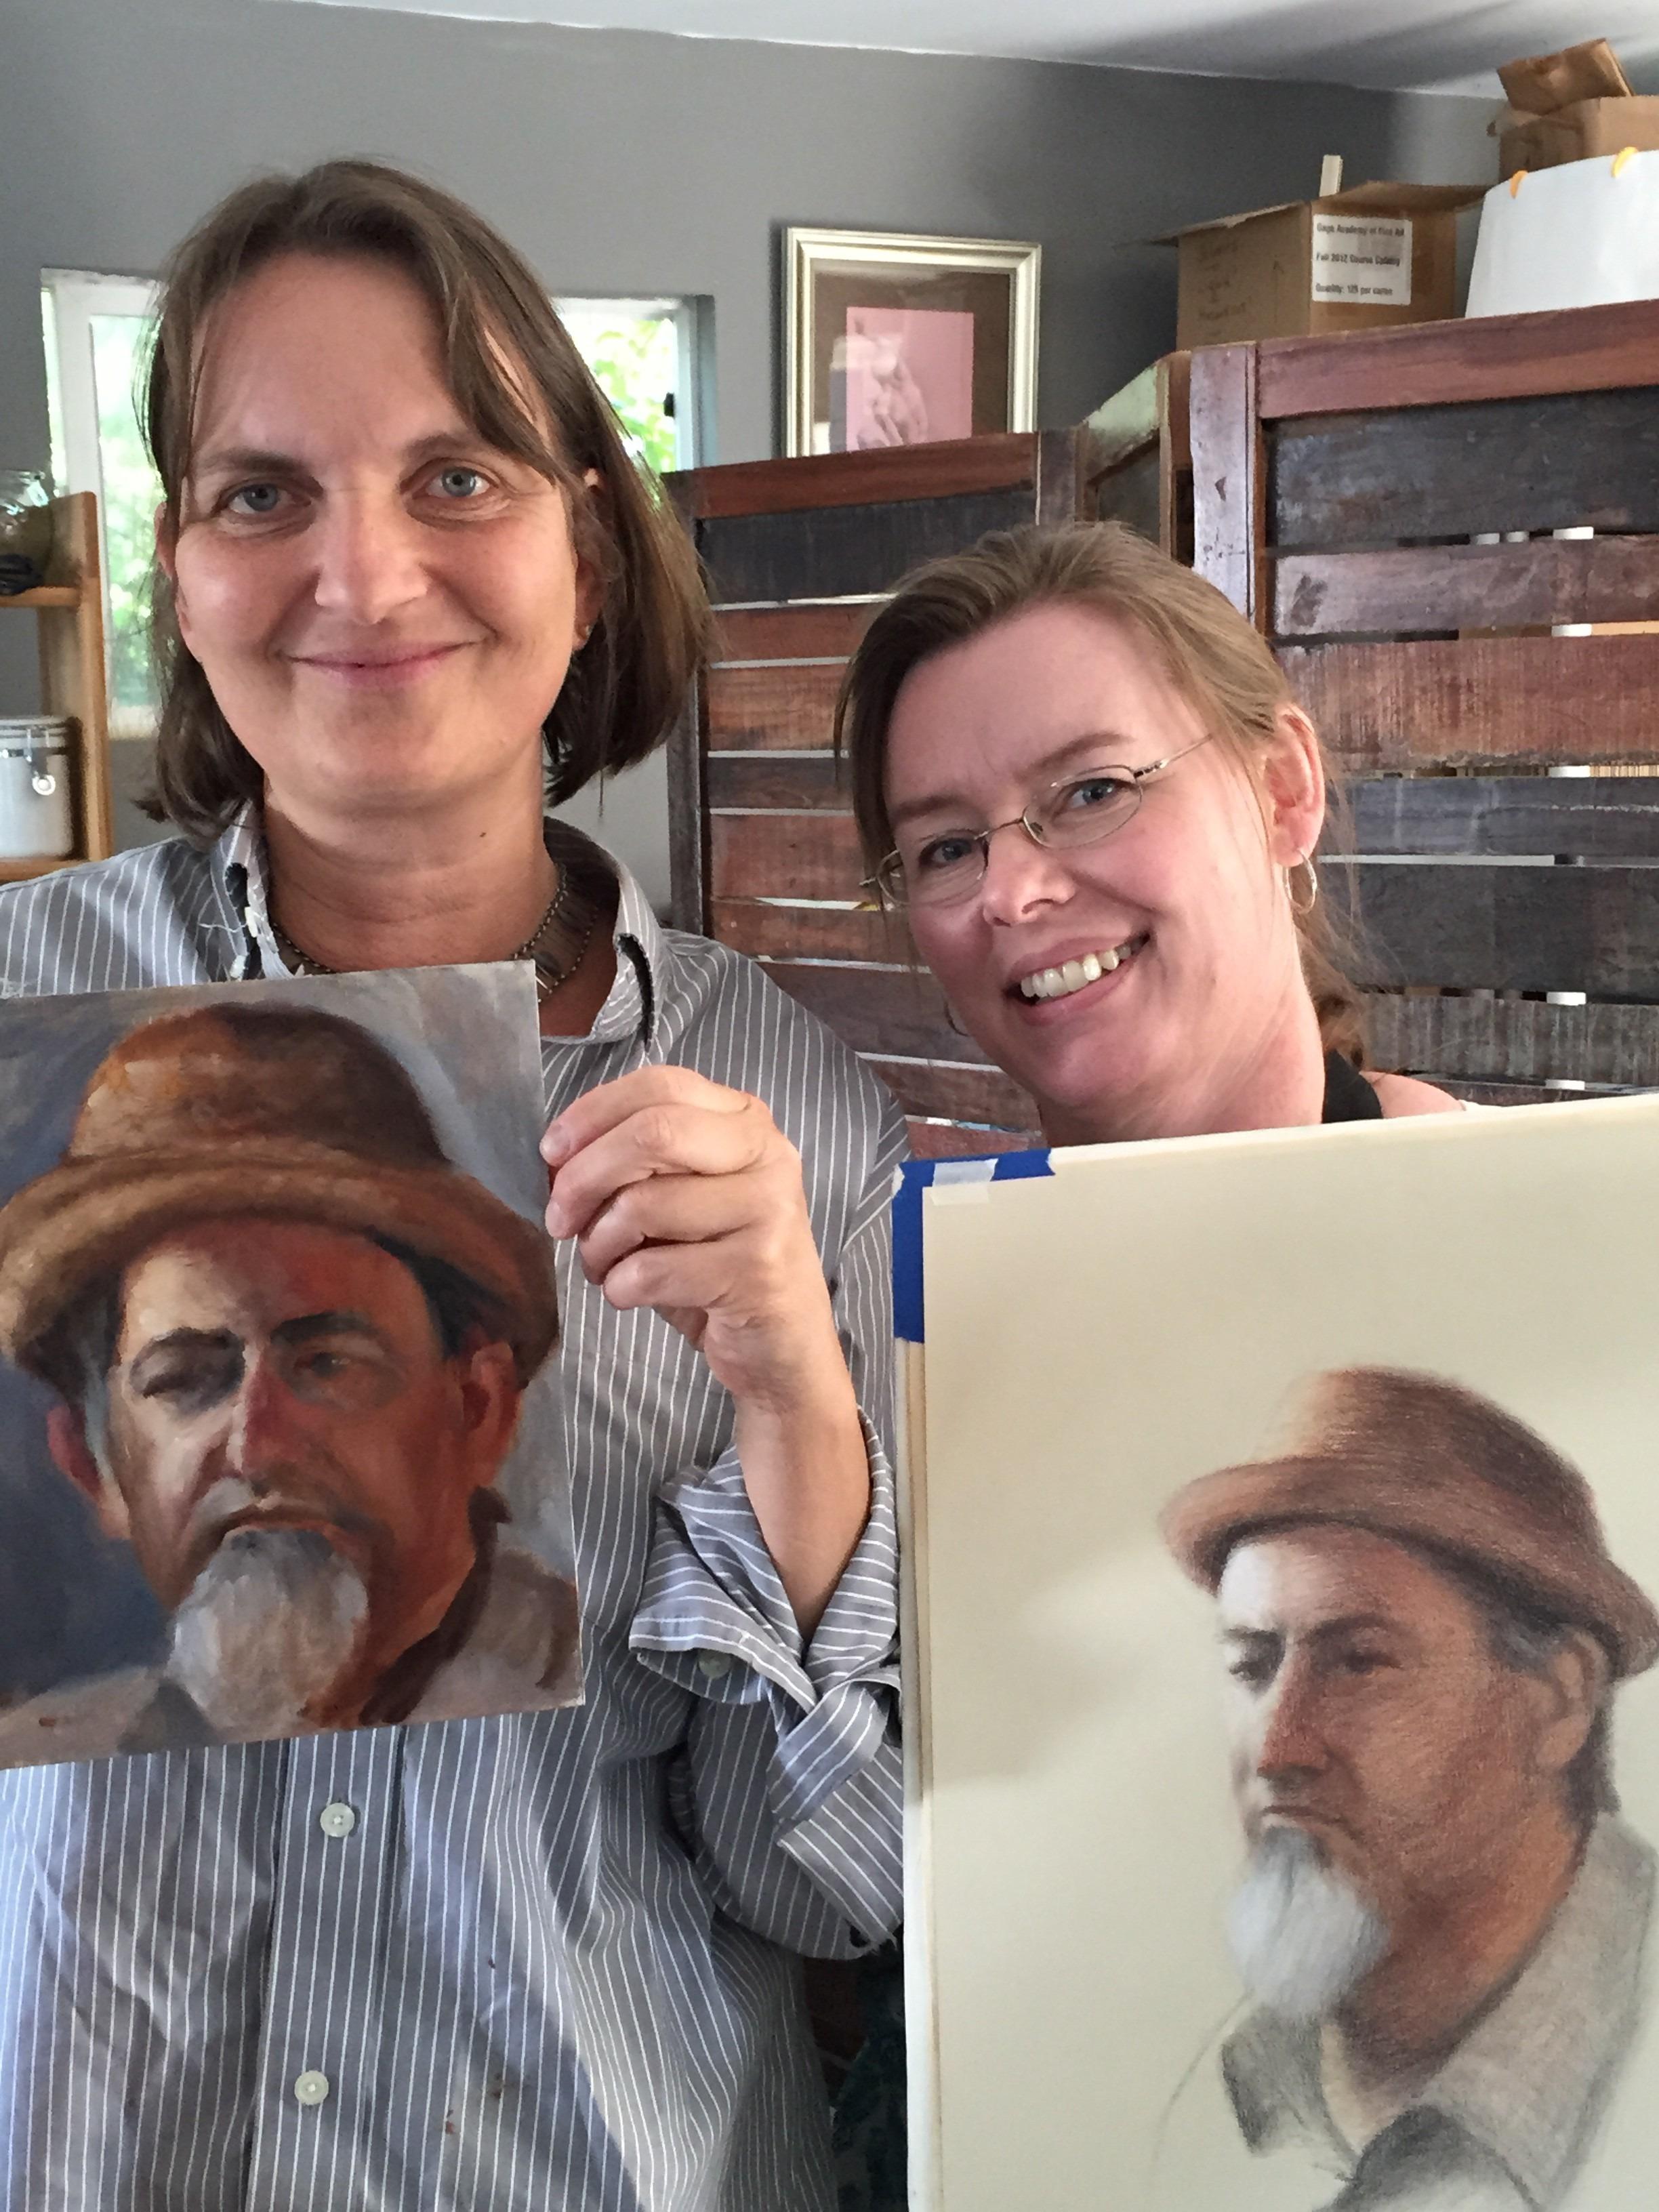 Karen Roth and Amanda Teicher